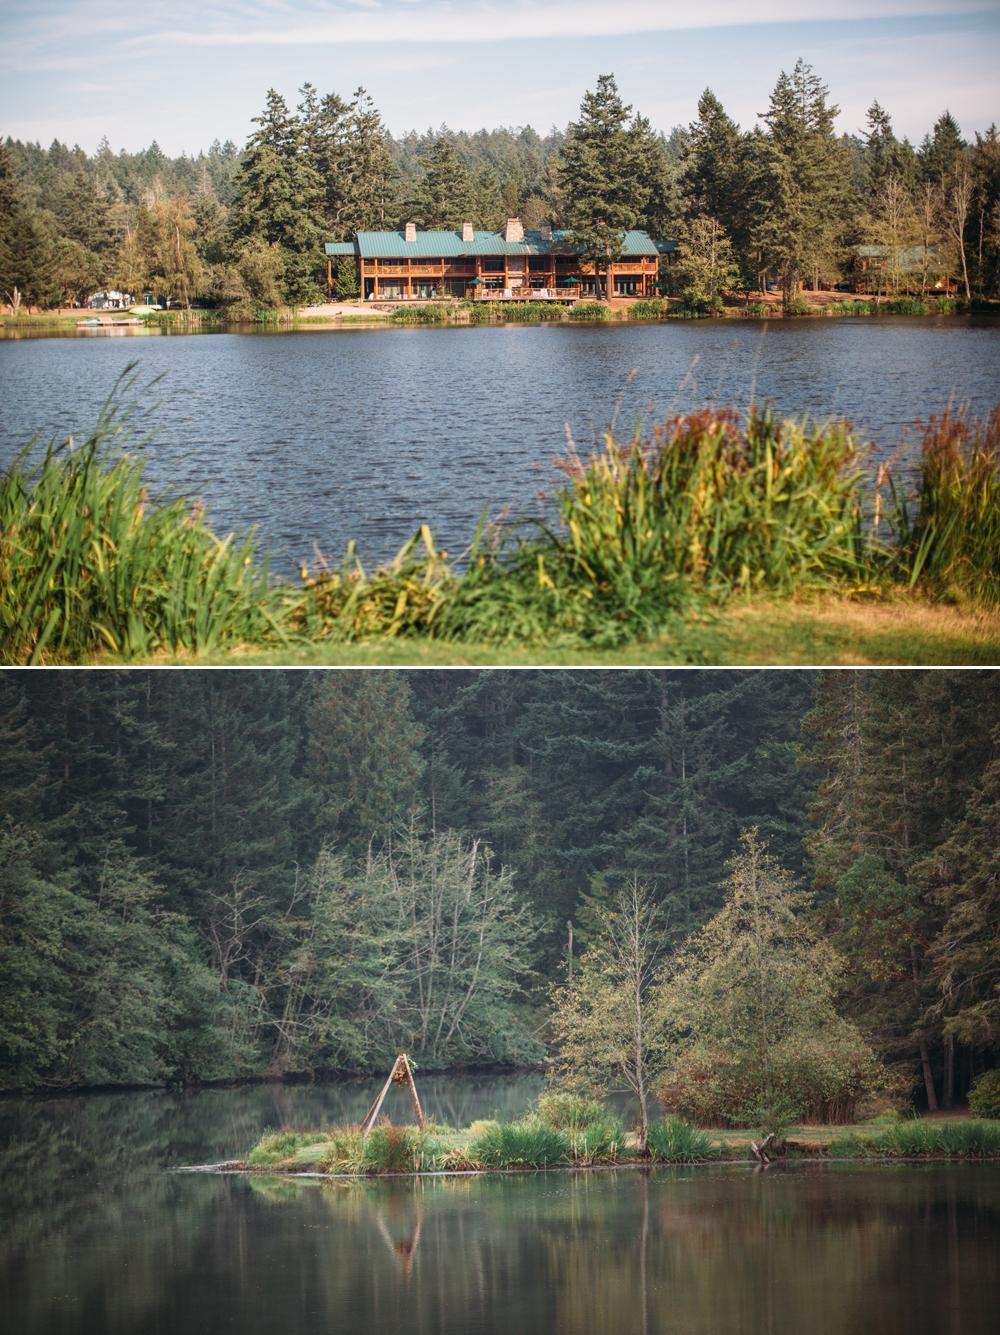 view-of-cabin-across-lake-and-wedding-teepee